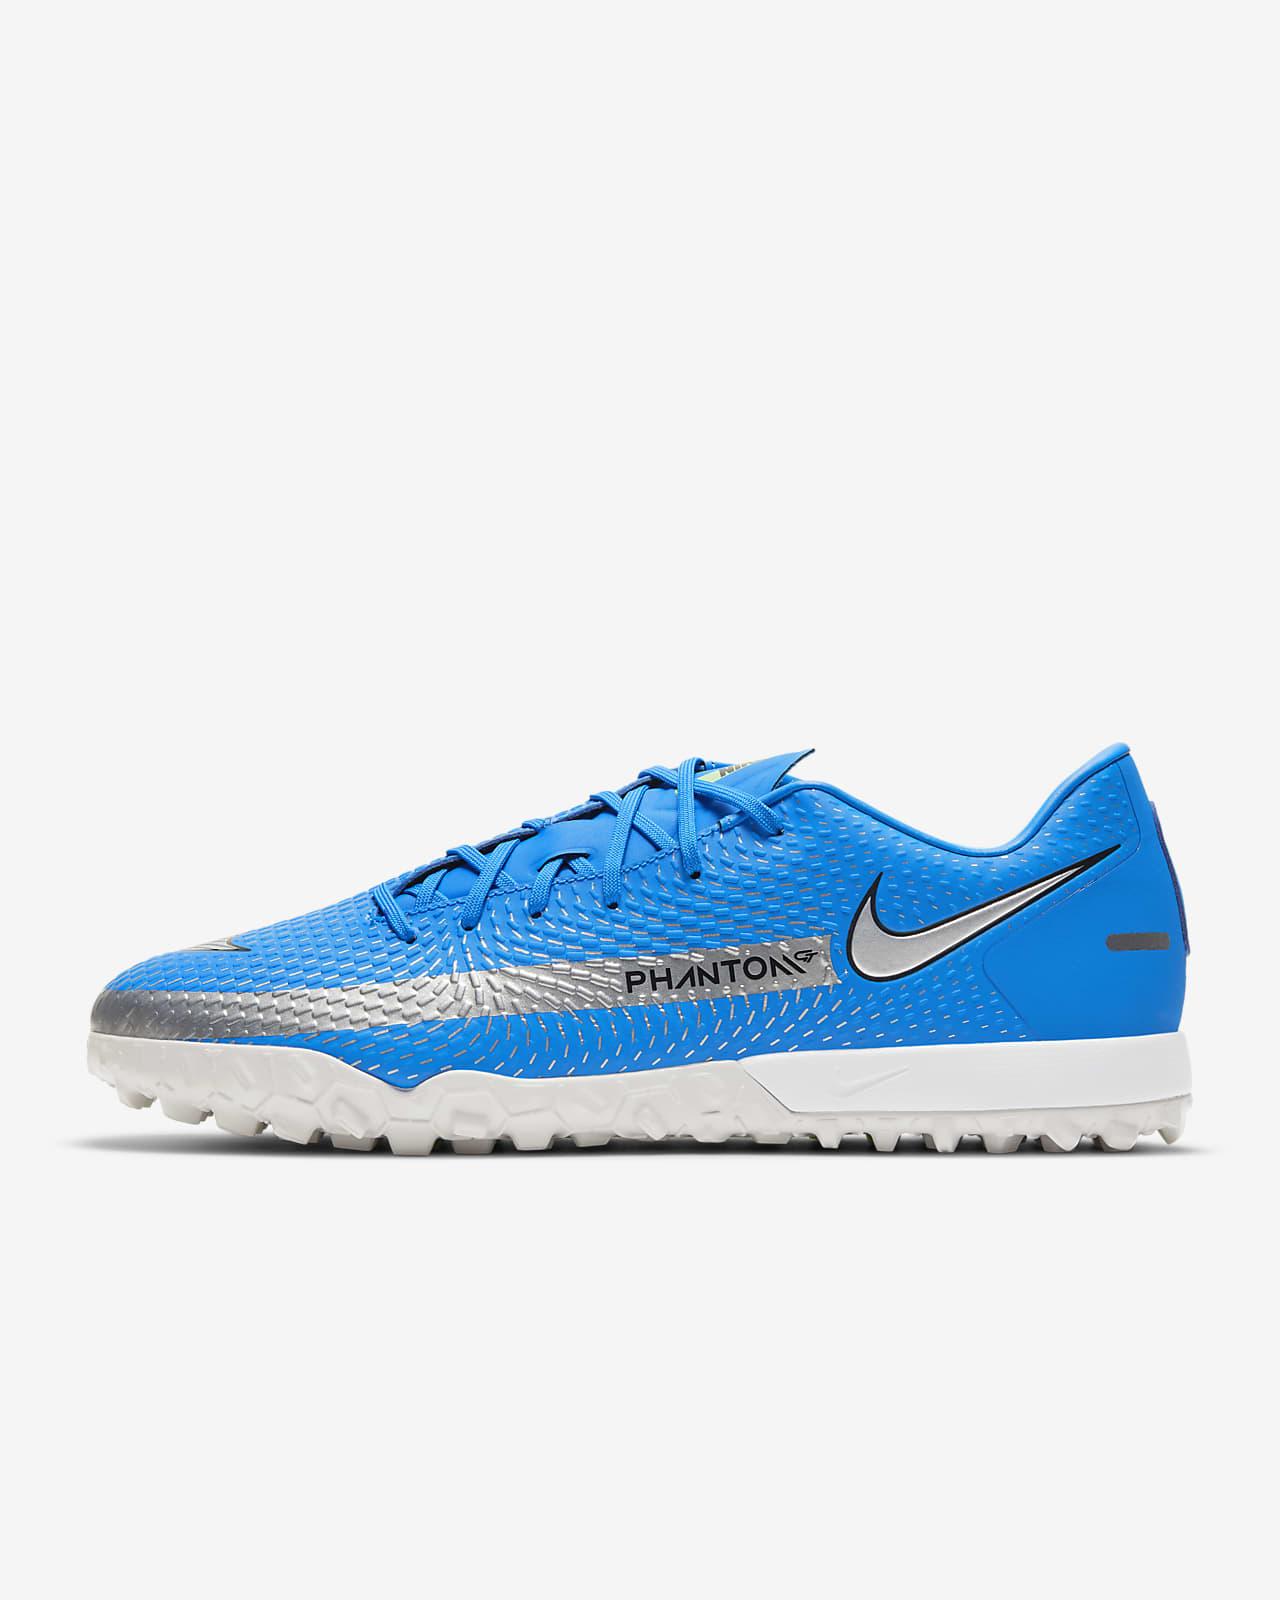 Chaussure de football pour surface synthétique Nike Phantom GT ...